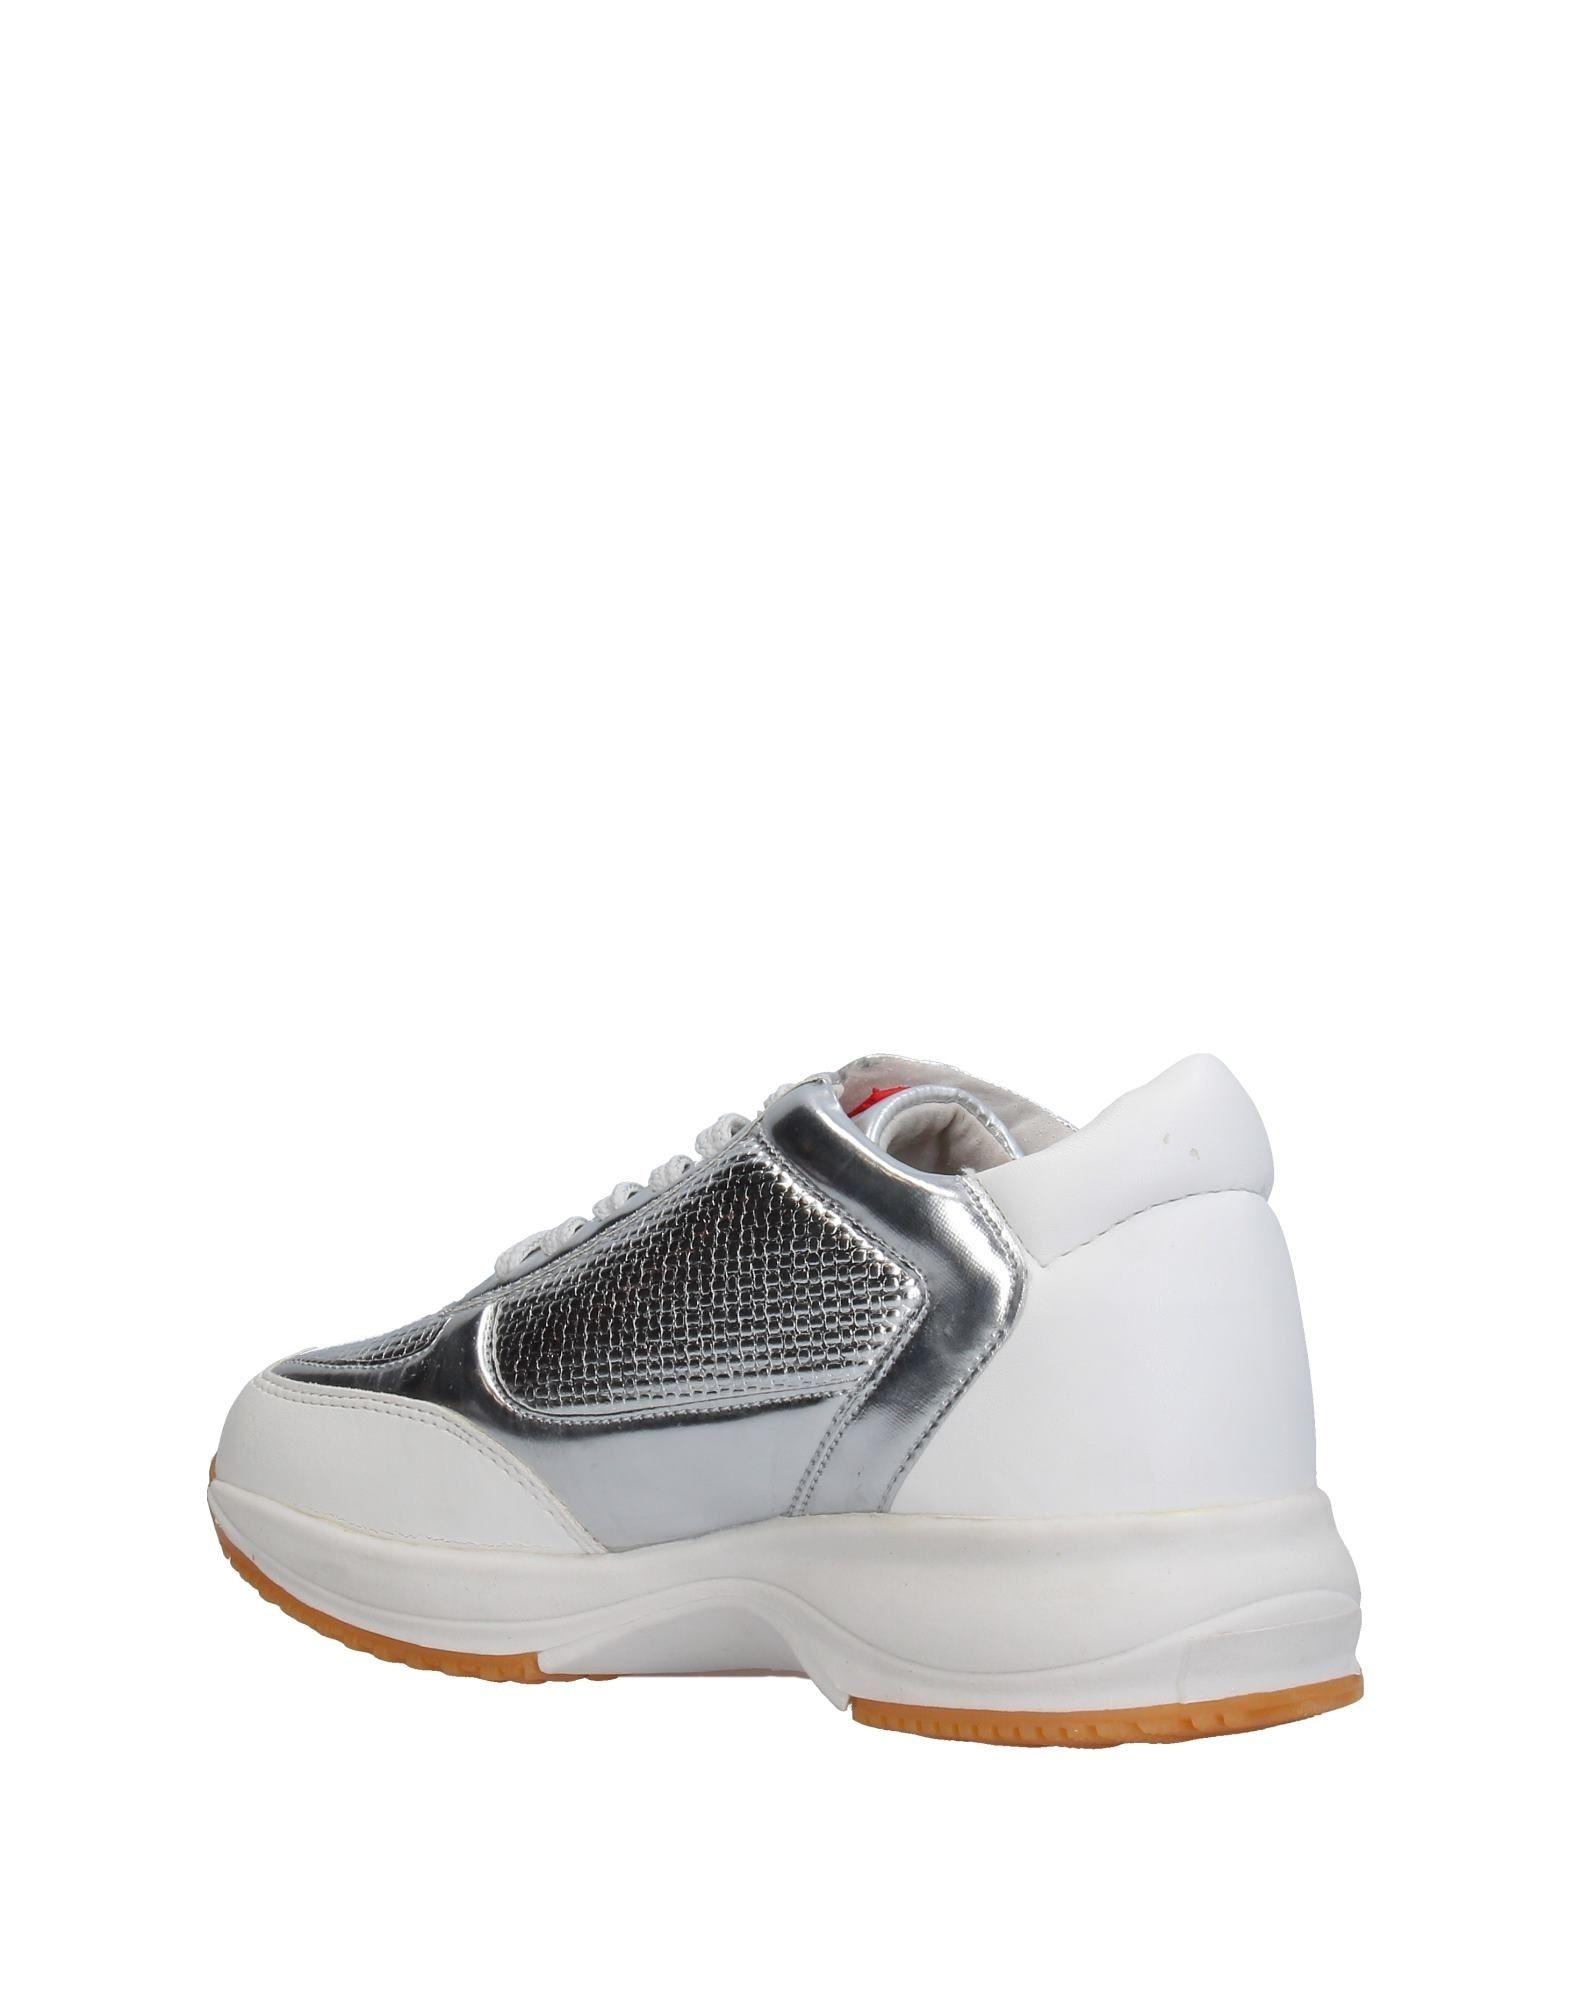 Sneakers Sandra Bon Femme - Sneakers Sandra Bon sur